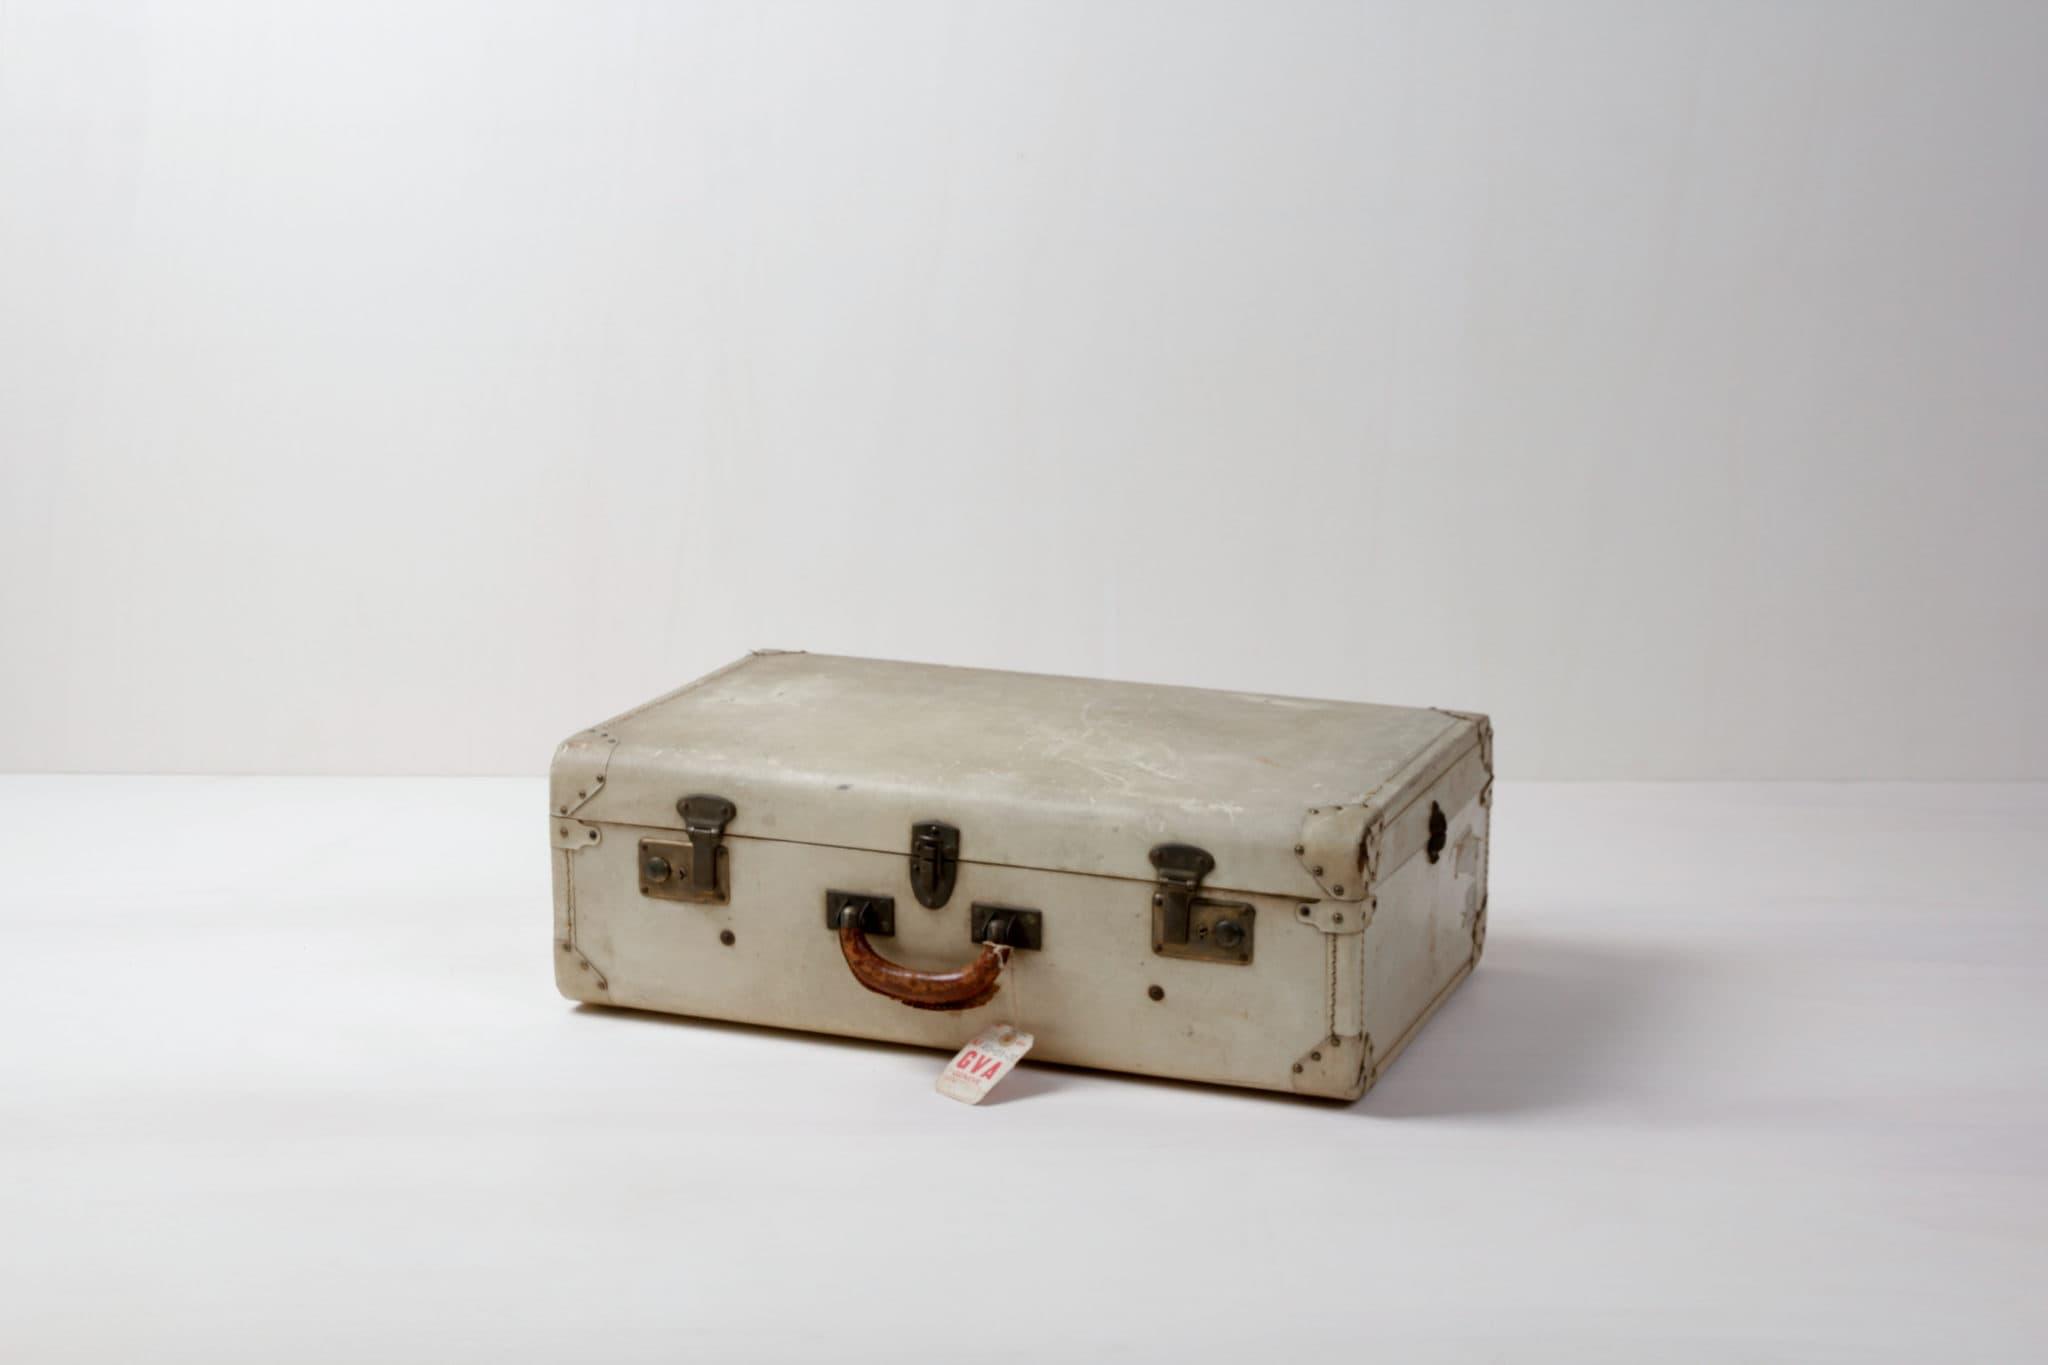 Deko Vintage Koffer, mieten, Verleih, Berlin